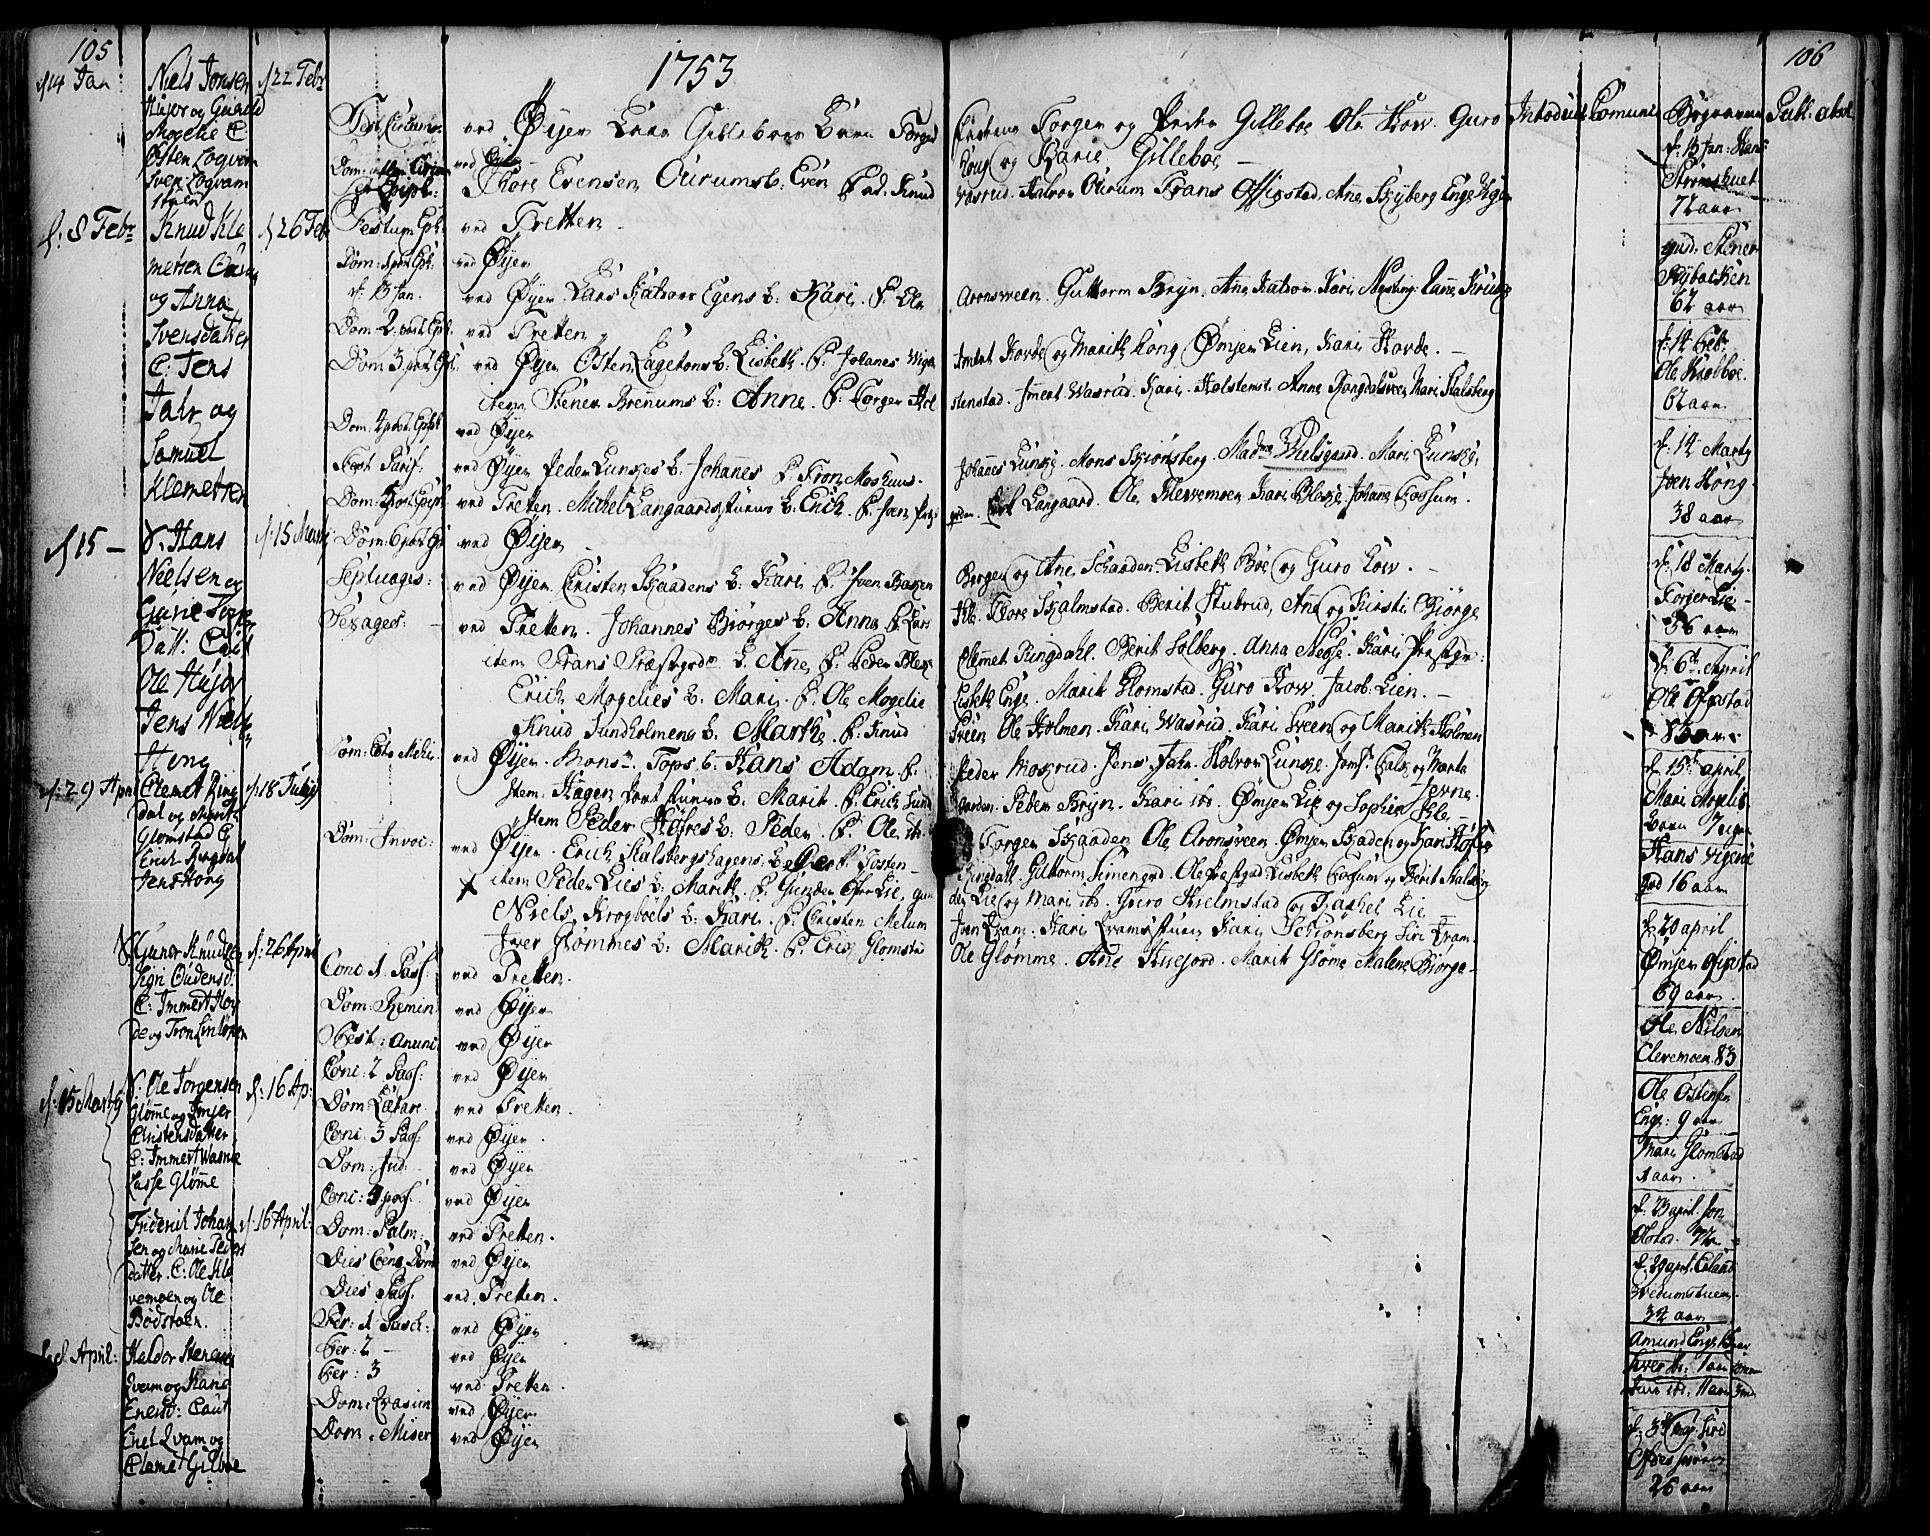 SAH, Øyer prestekontor, Ministerialbok nr. 2, 1733-1784, s. 105-106